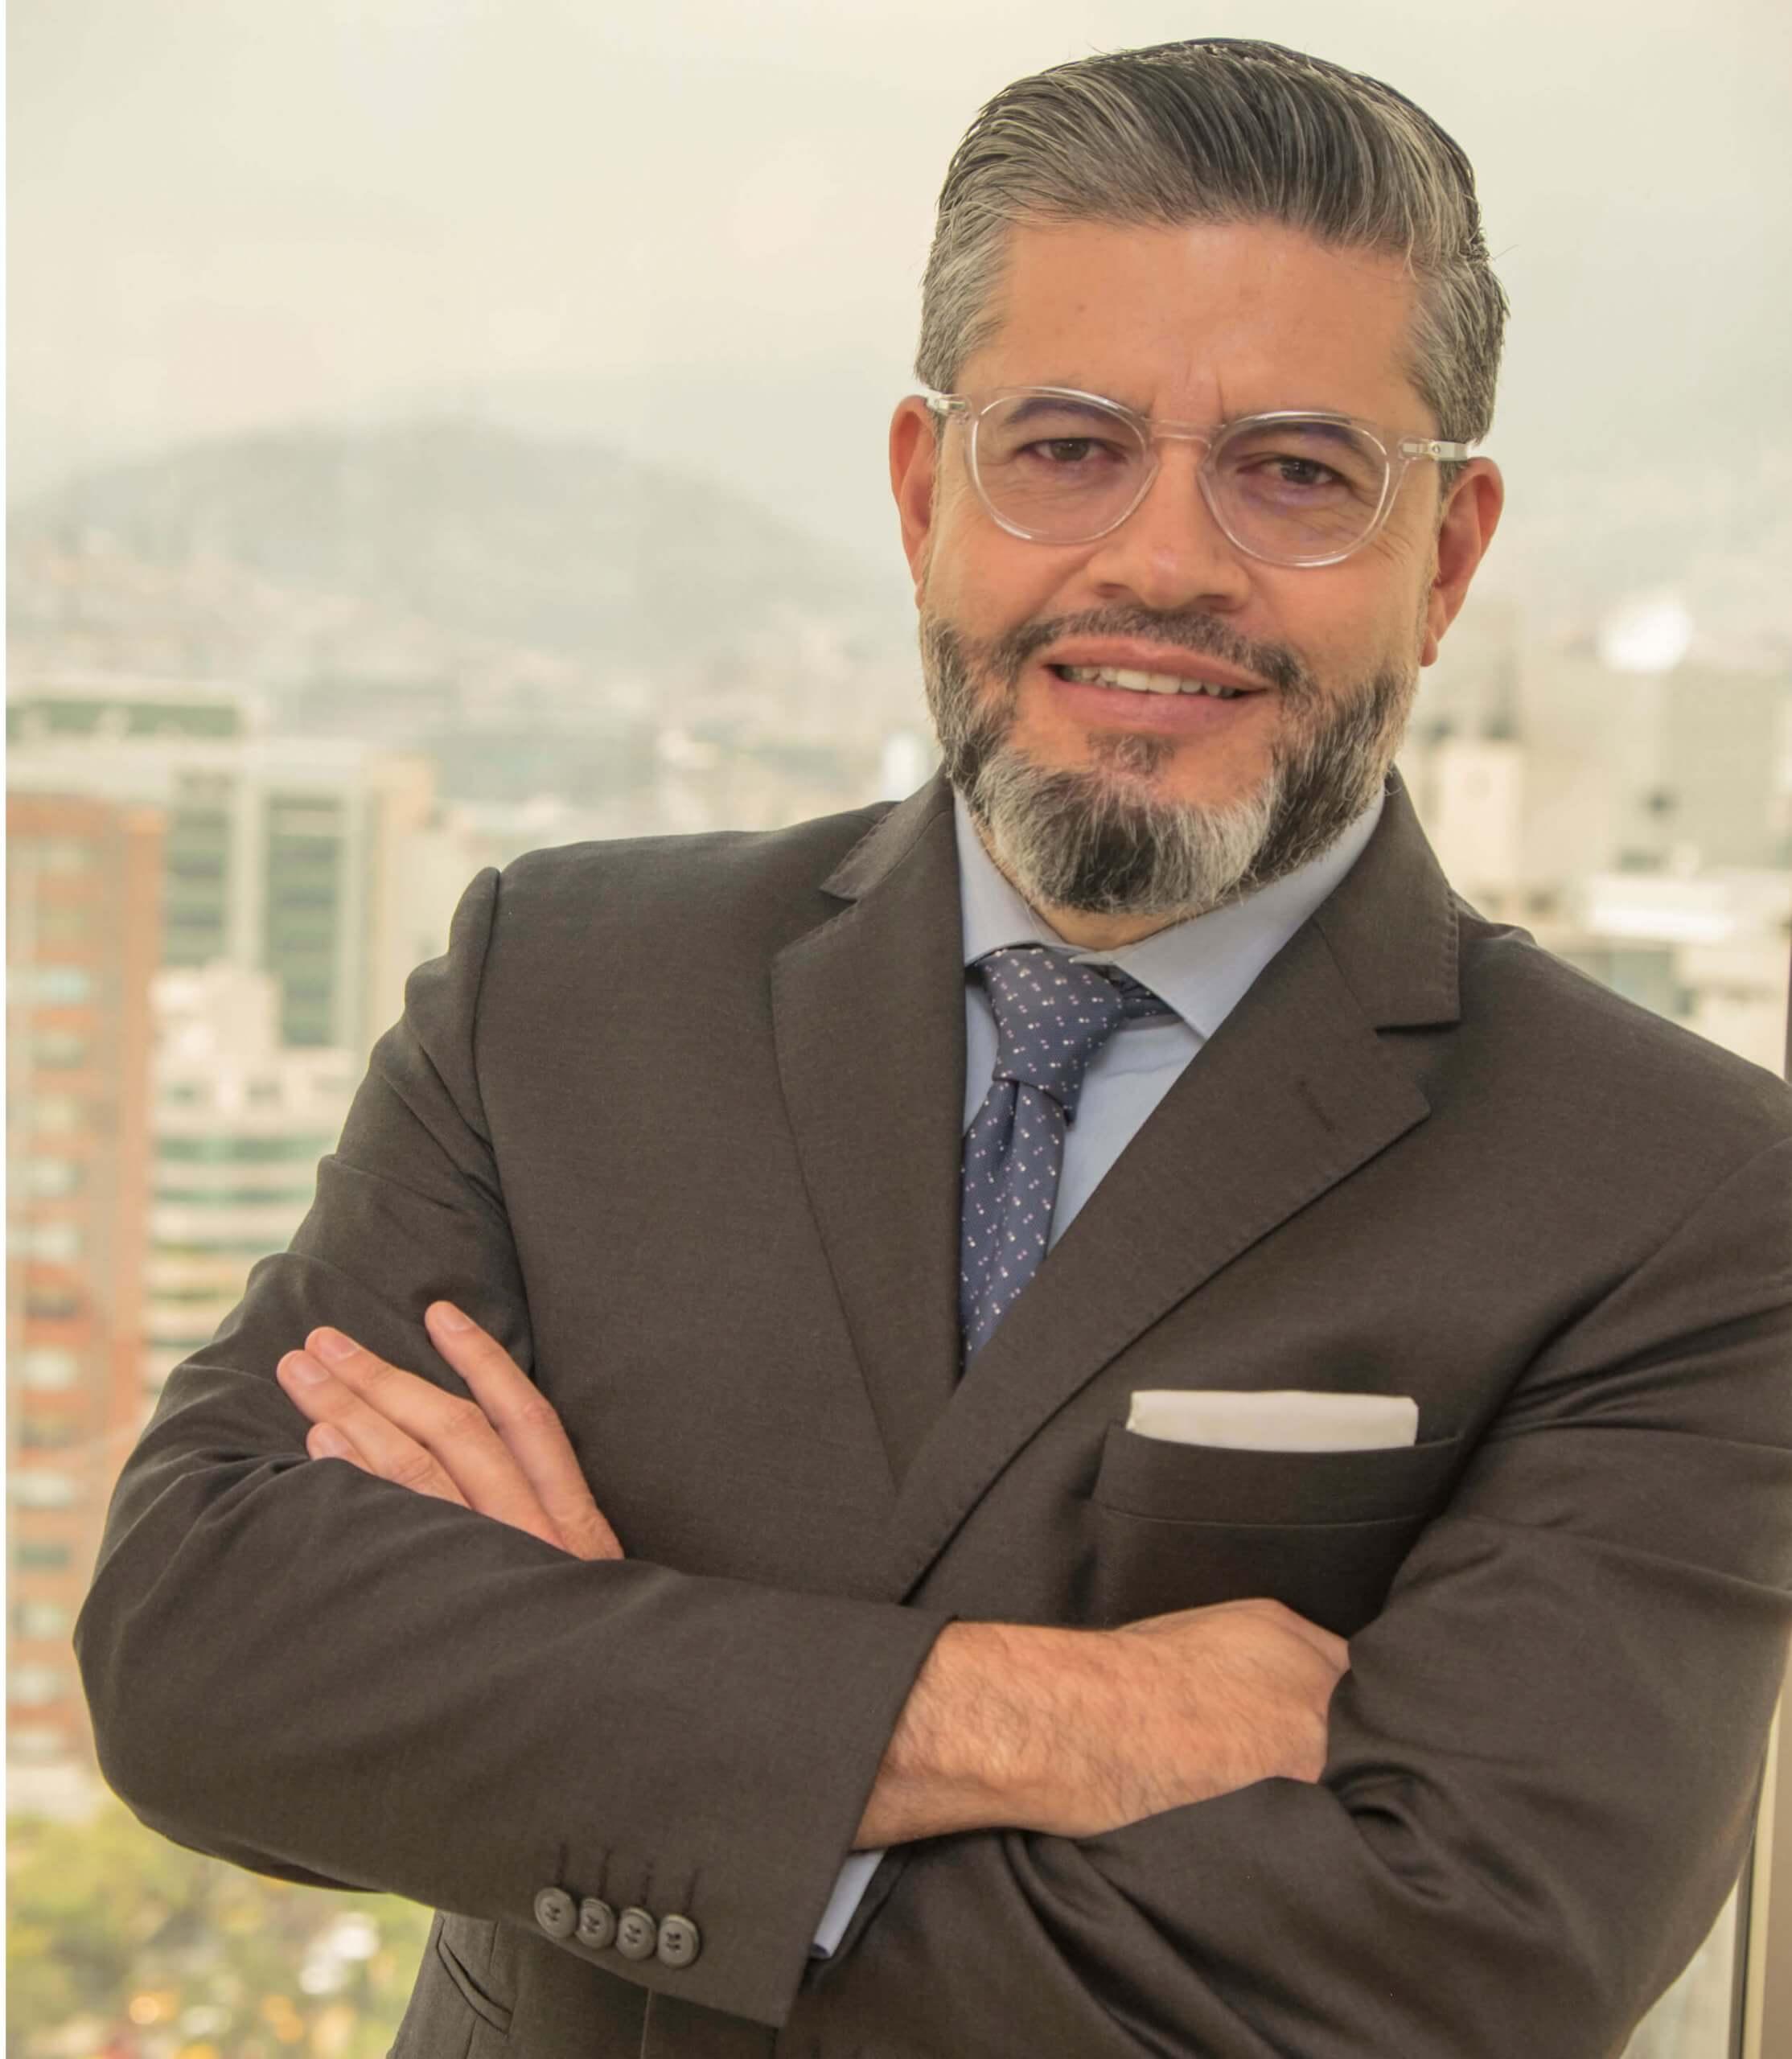 Cesar Zumarraga